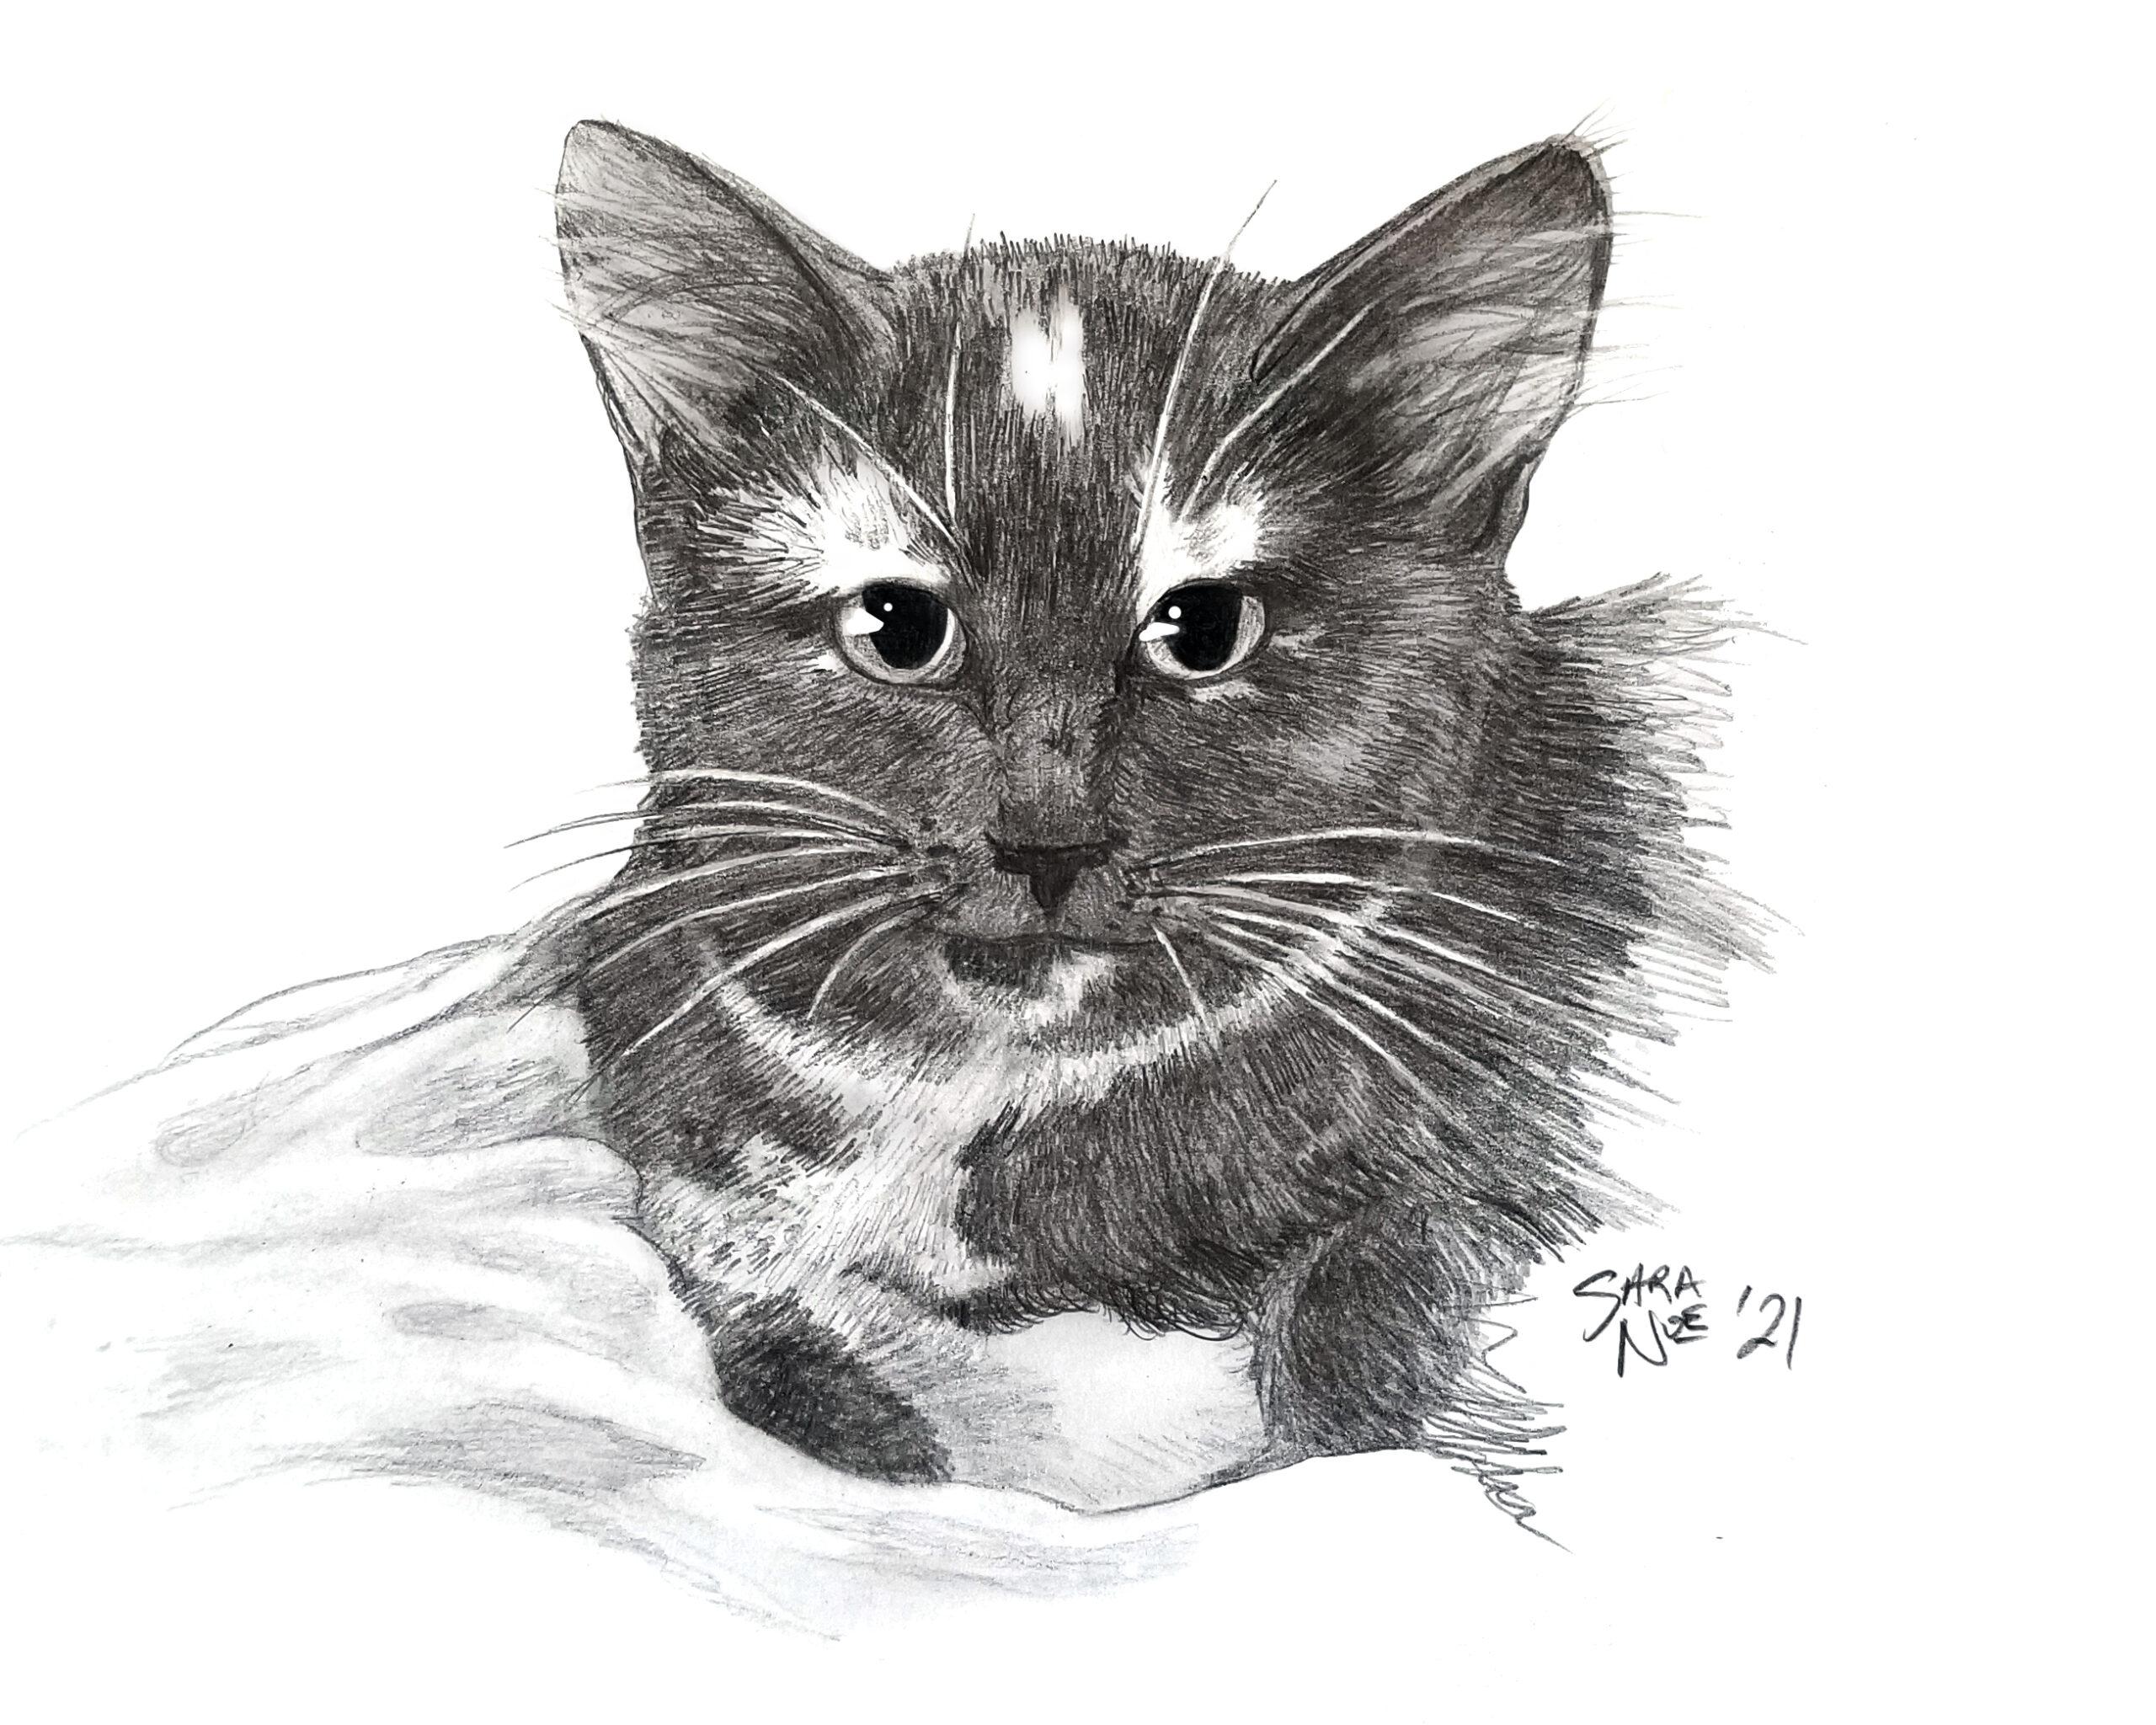 Pencil sketch of calico cat by Sara A. Noe